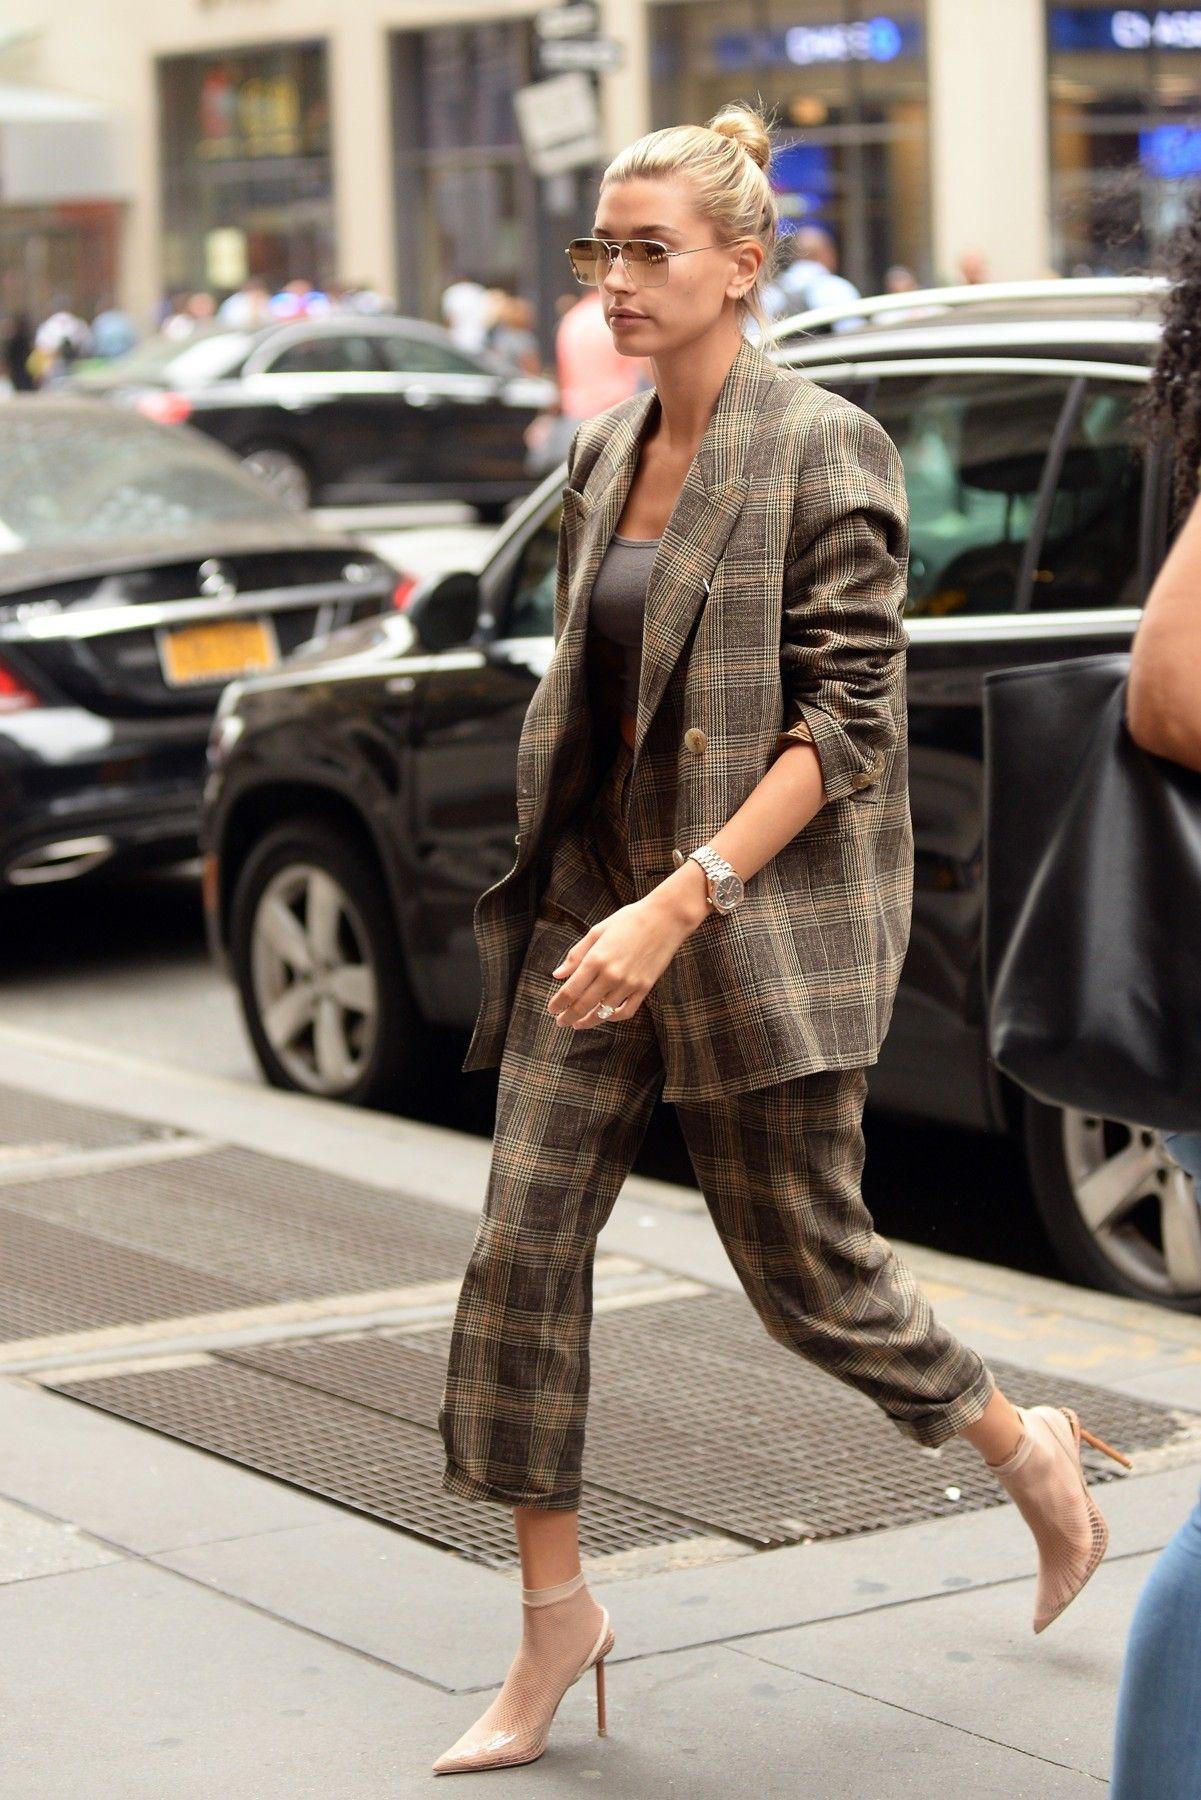 ada47c1bdcf5 Hailey Baldwin wears Acne Studios Checked Trousers